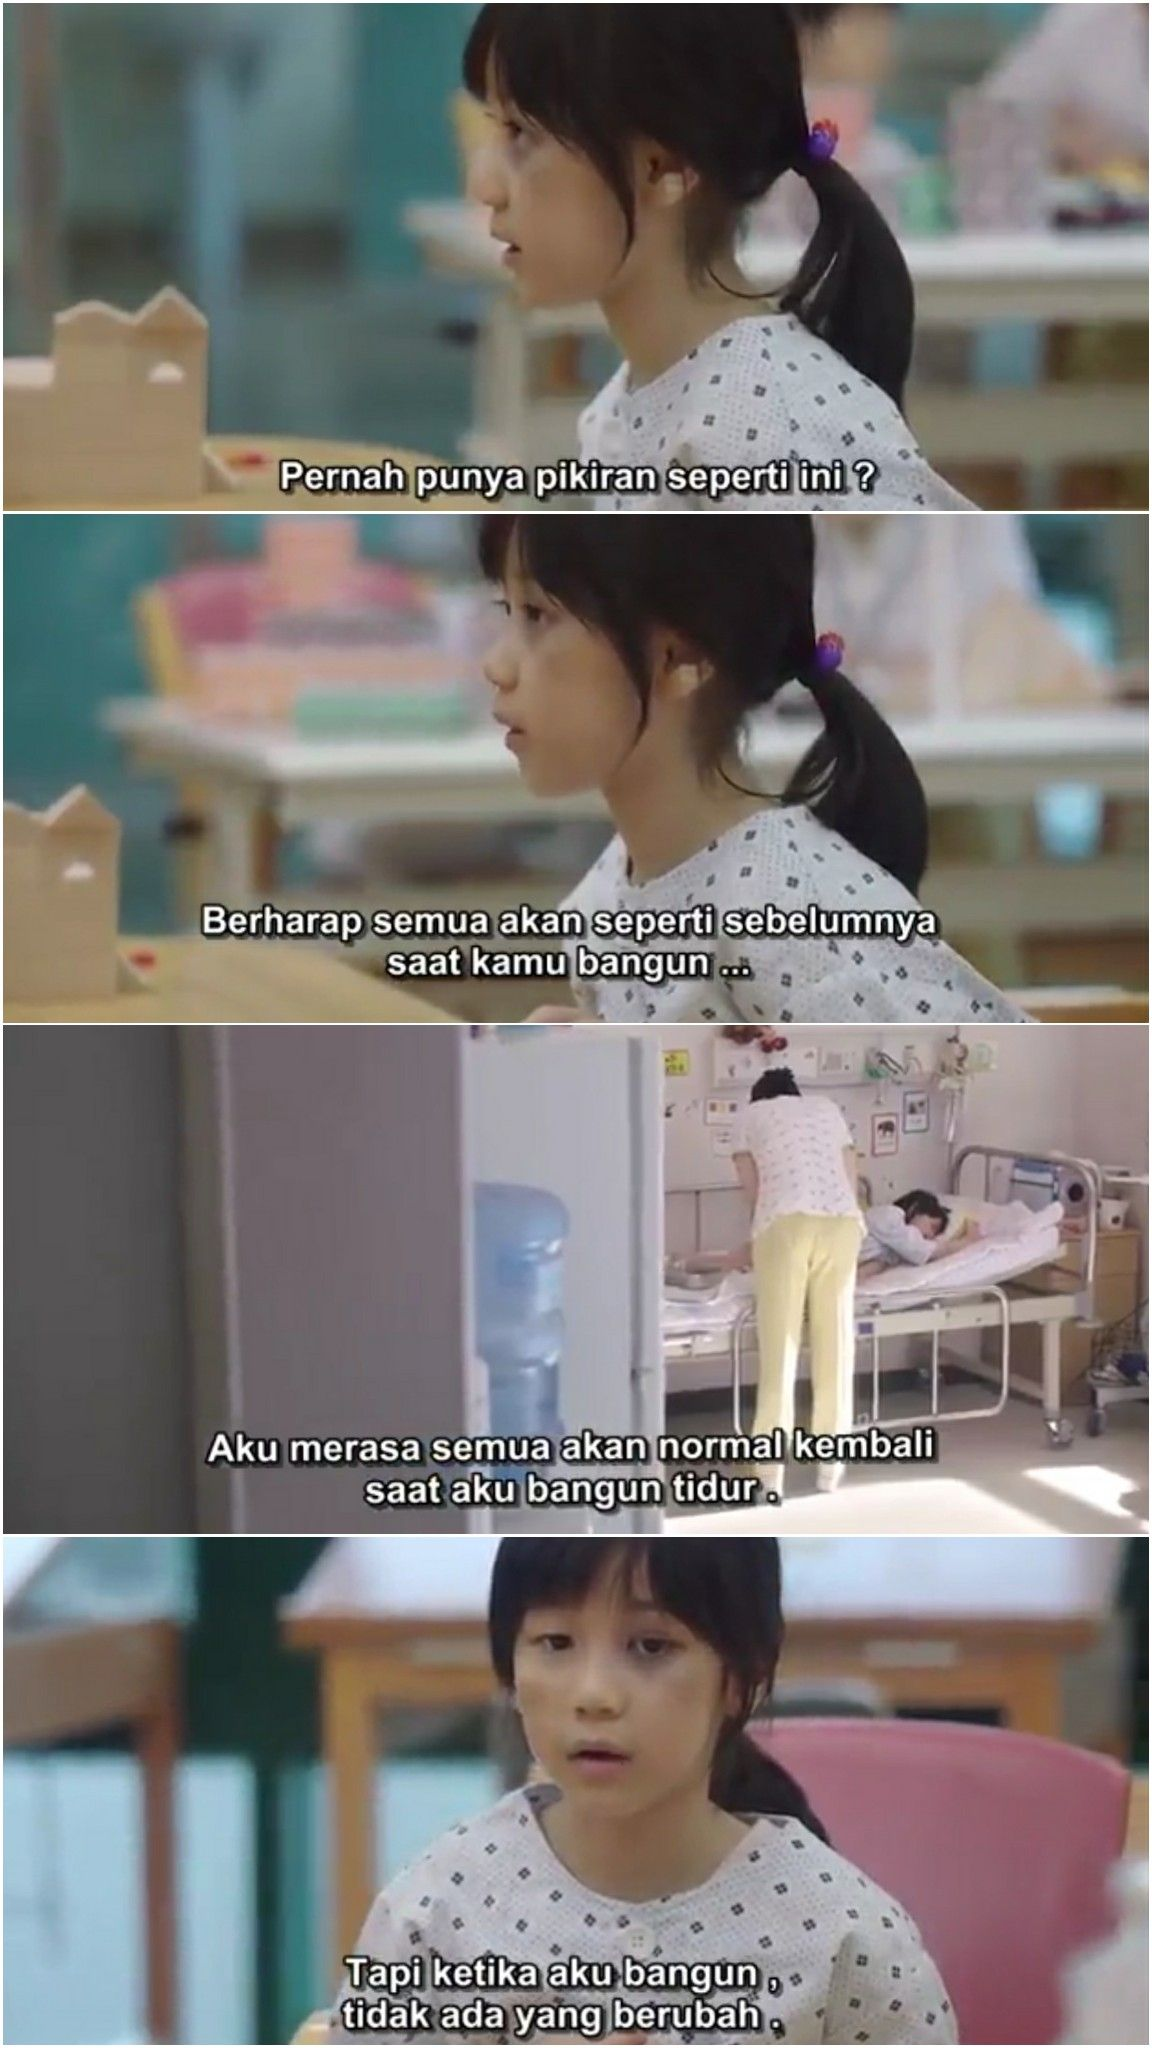 Hope (2013) | Kutipan pelajaran hidup, Kata-kata indah, Motivasi